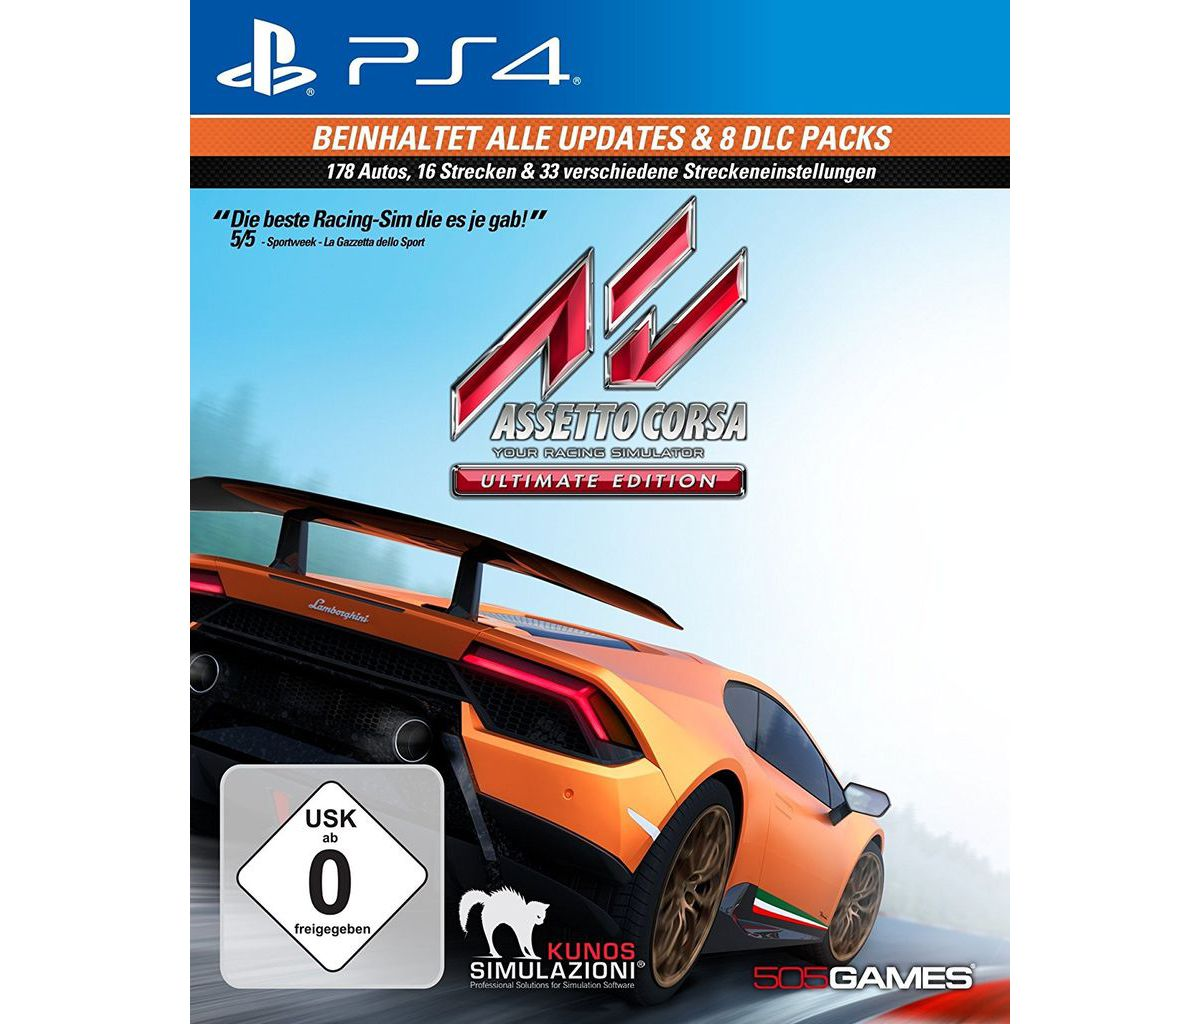 NBG Playstation 4 - Spiel »Assetto Corsa Ultima...